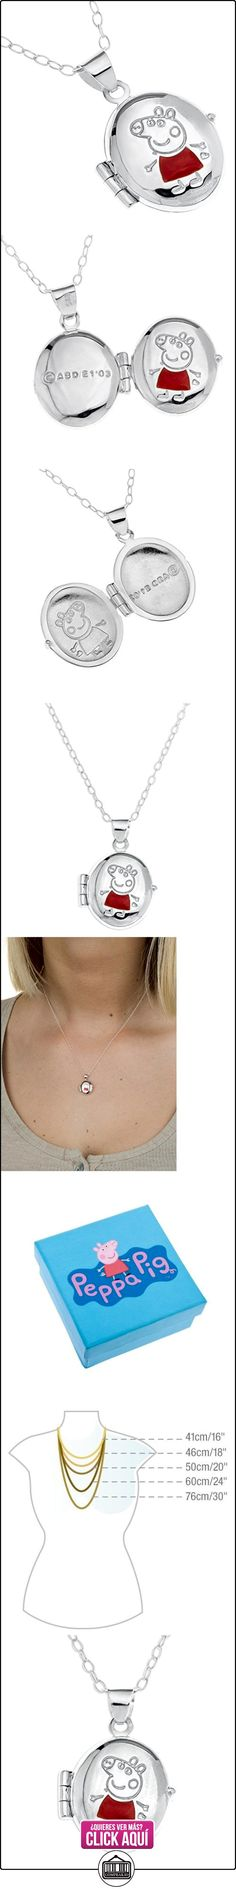 Collier - SP723 - Collar de peppa pig  niño de plata de ley  ✿ Peppa Pig - Peppa La Cerdita ✿ ▬► Ver oferta: http://comprar.io/goto/B0049HAIA2